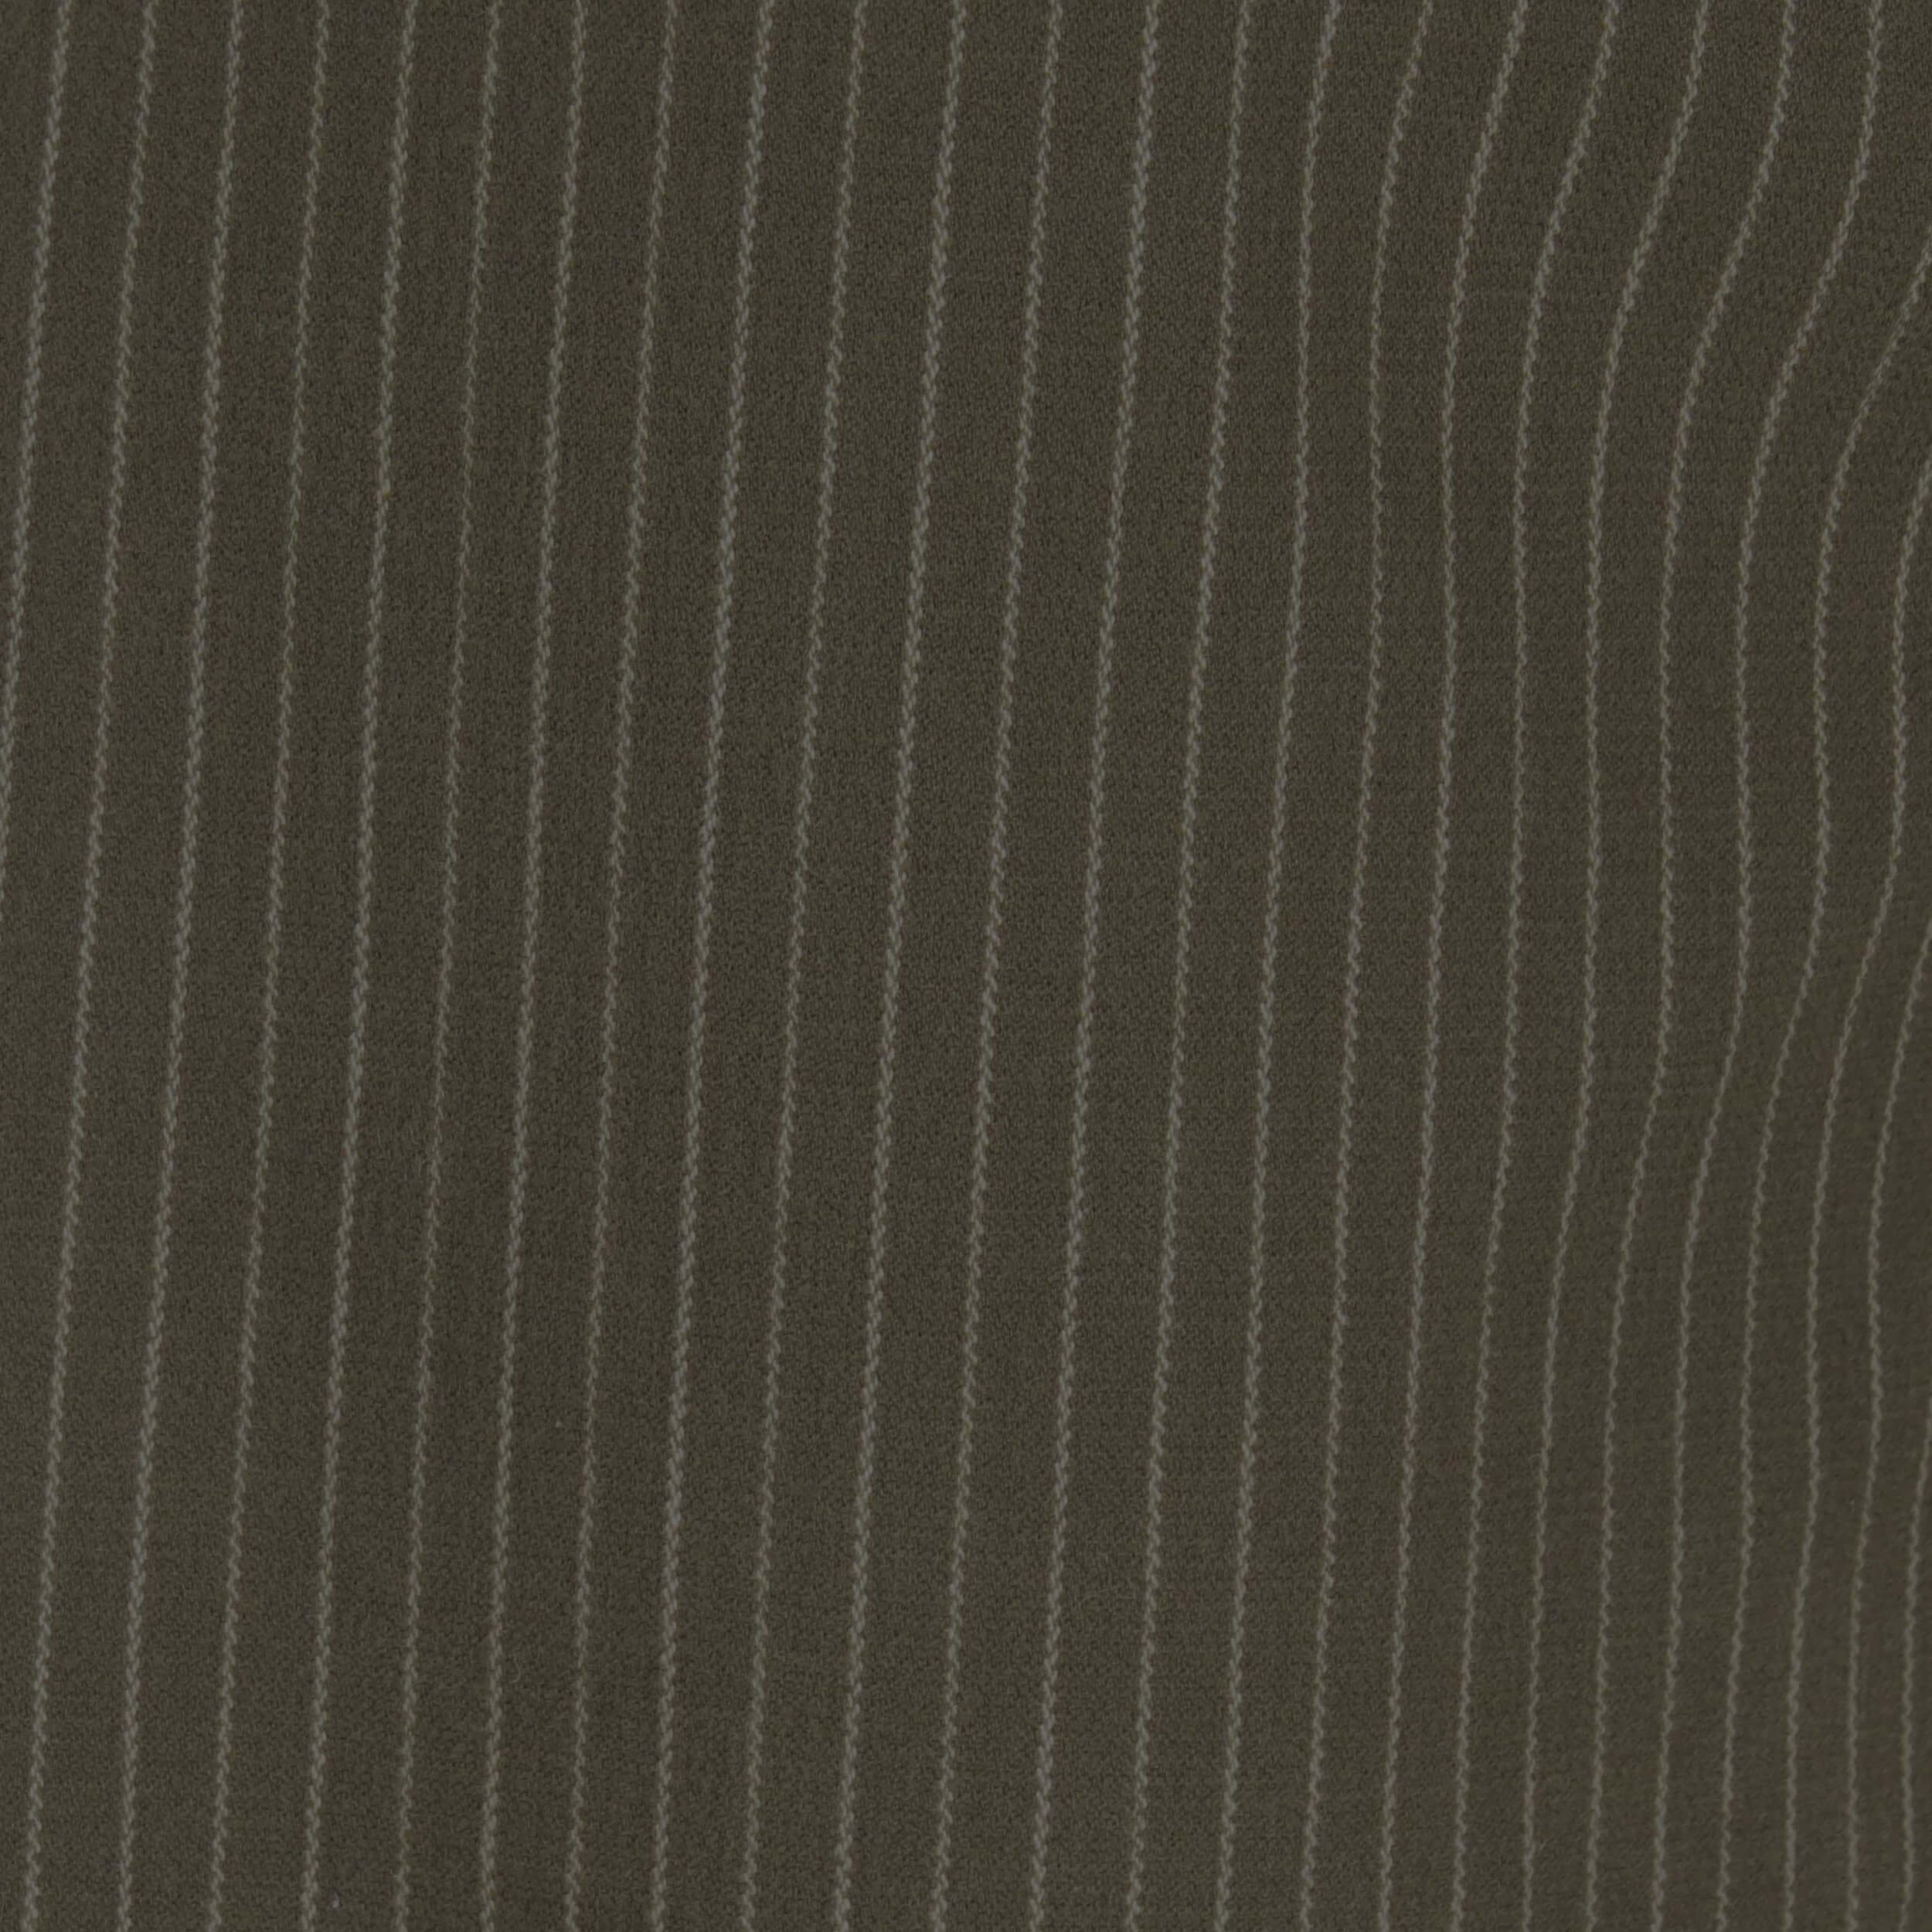 Chervo Herren Hose Salio 37D  braun/grau gestreift